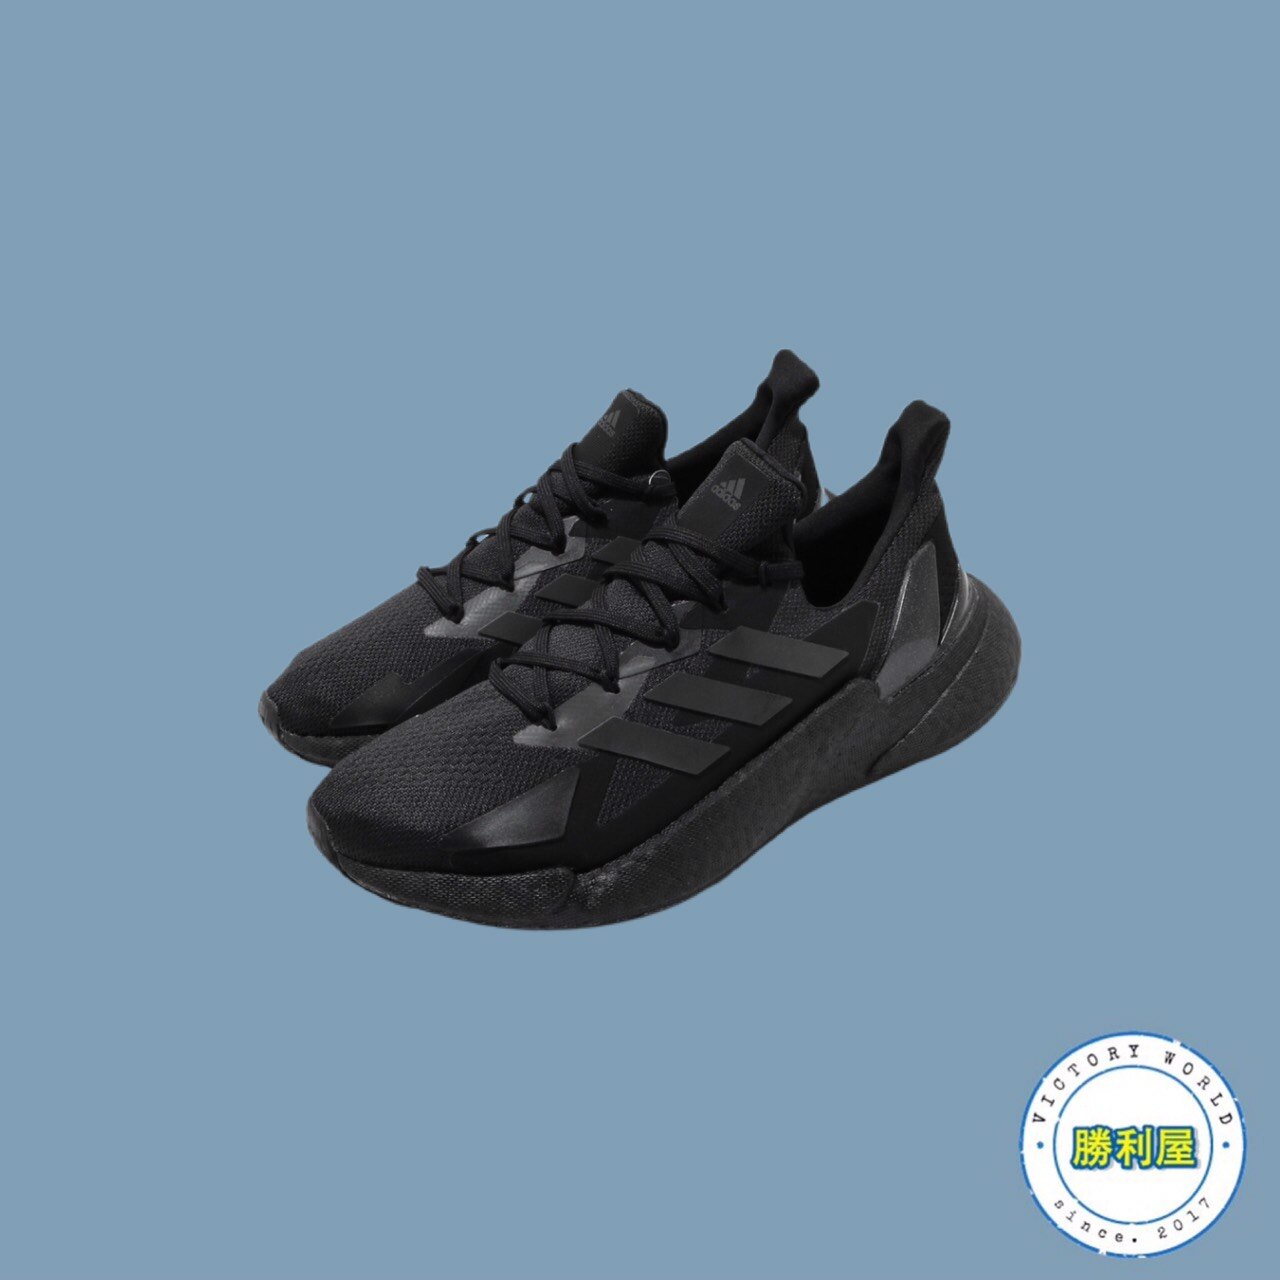 【ADIDAS】ADIDAS X9000L4 男鞋 休閒鞋 運動鞋 慢跑鞋 全黑 黑魂 BOOST 軟底 特價下殺 FW8386【勝利屋】